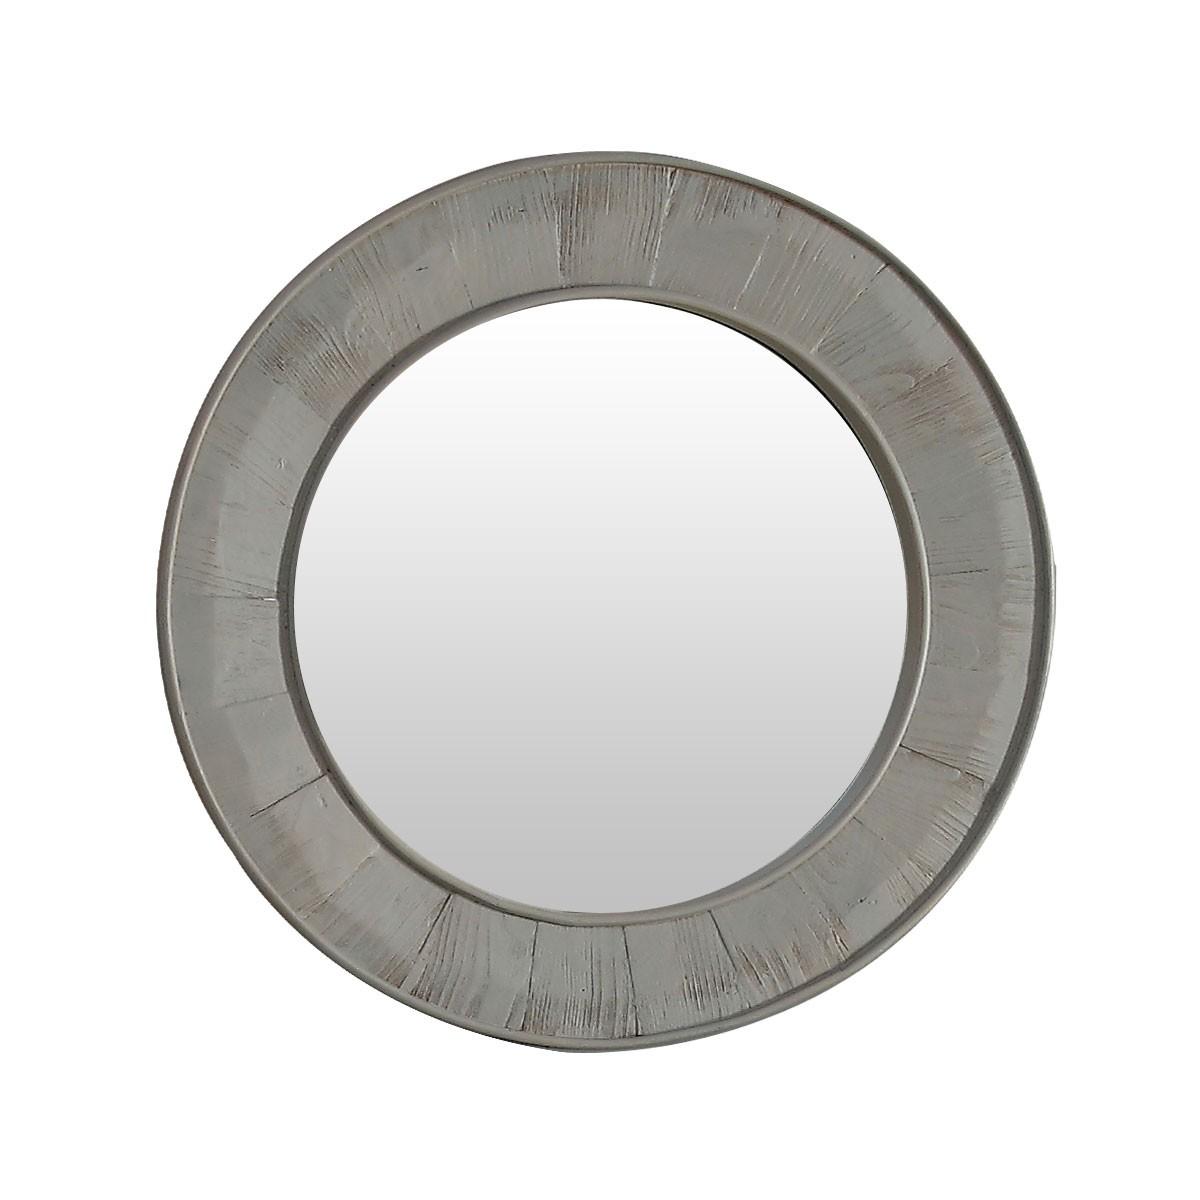 28 x 28 In Round Bath Vanity Décor Mirror with Fir Wood Frame (DK-WK2911-GY)